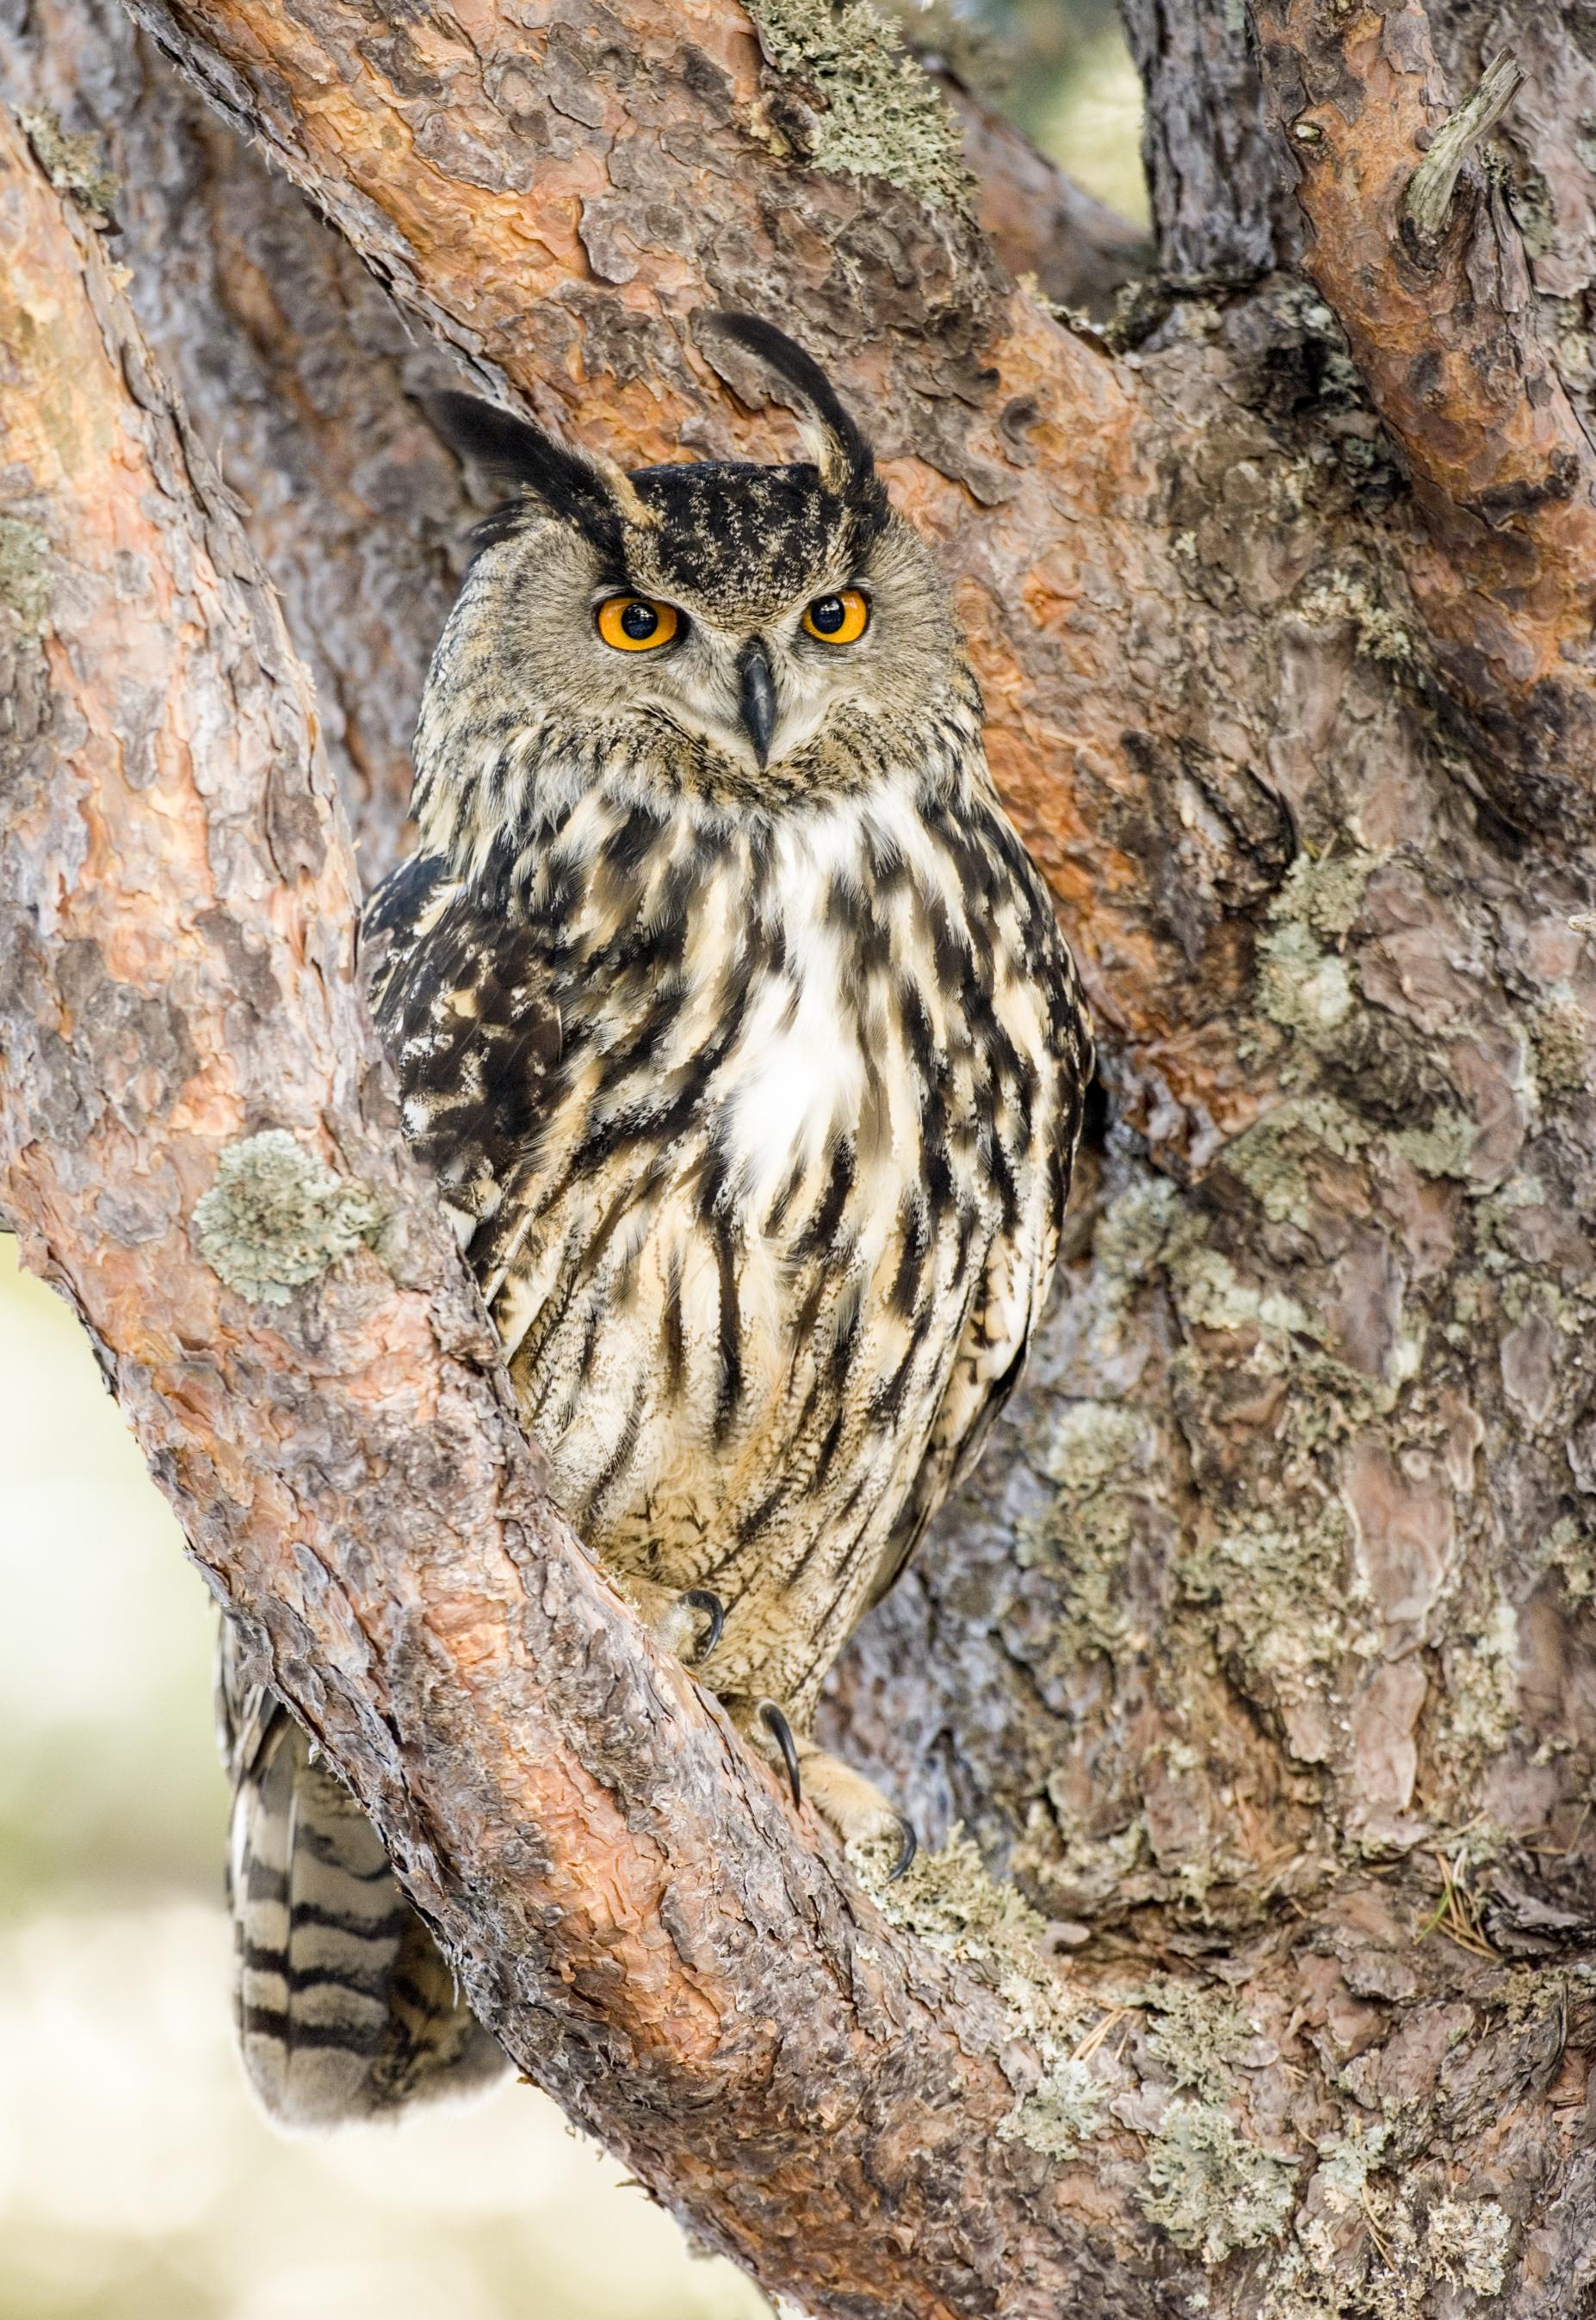 Long Eared Owl at Eccleston Park Golf Club